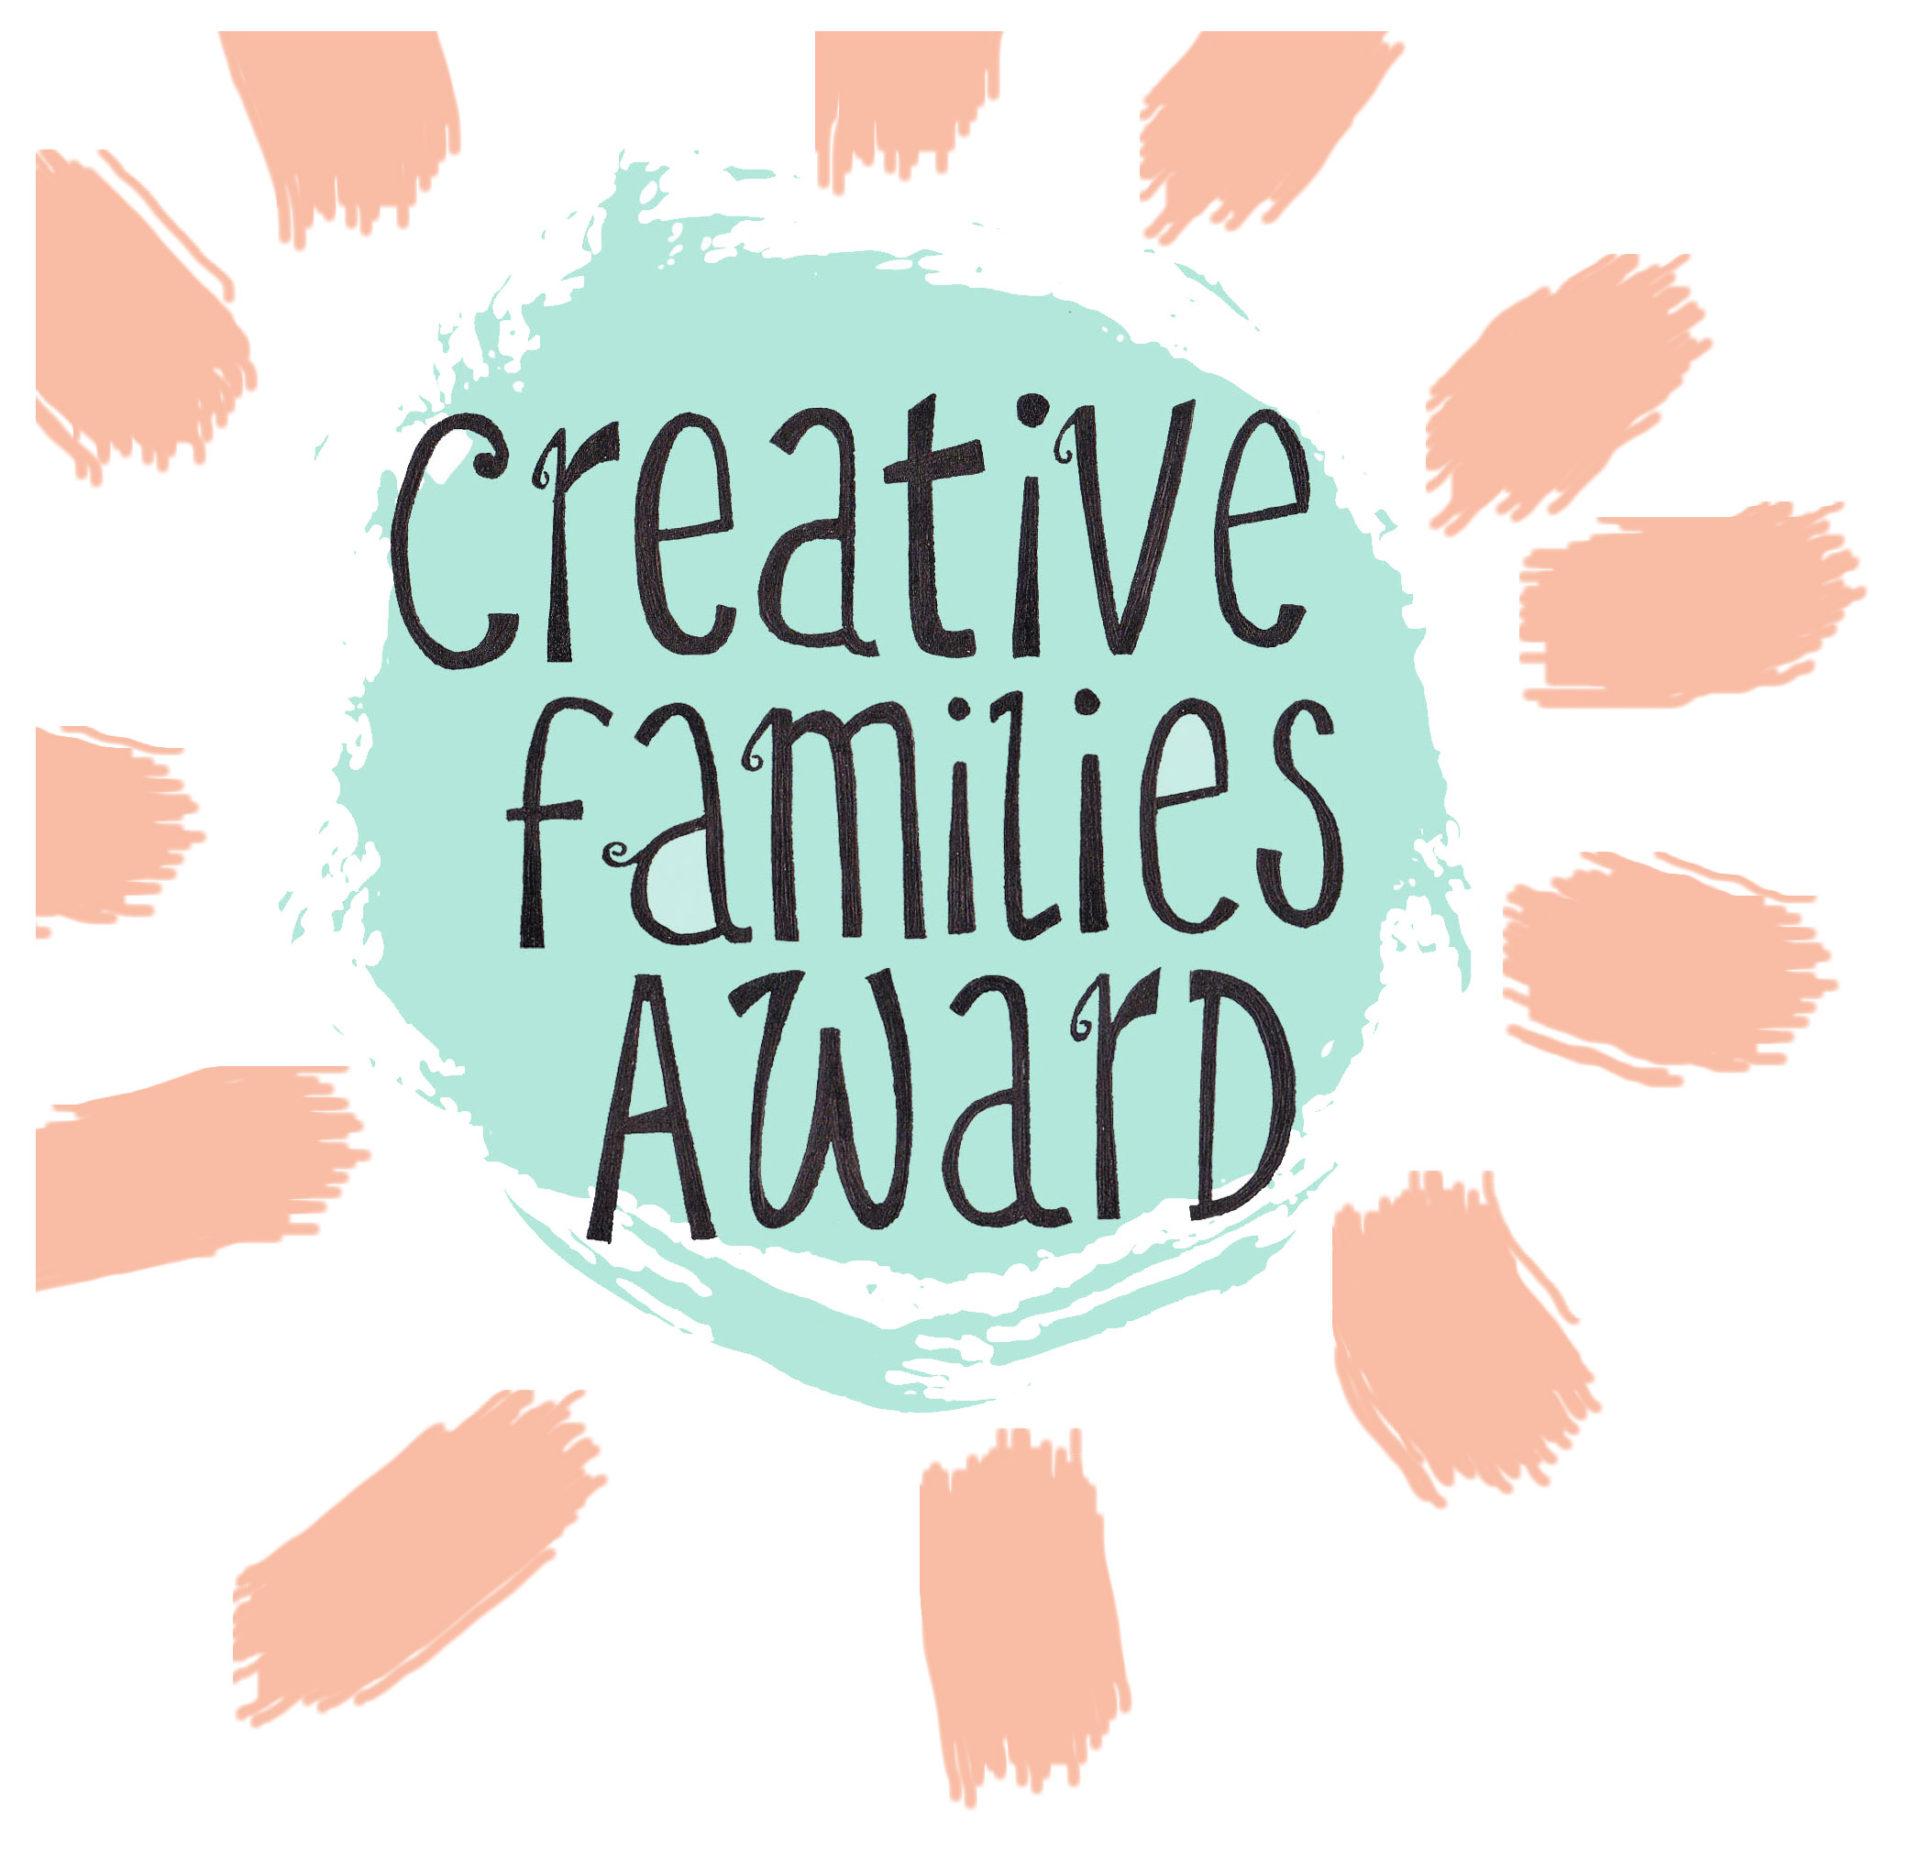 Creative Families Award sunburst logo